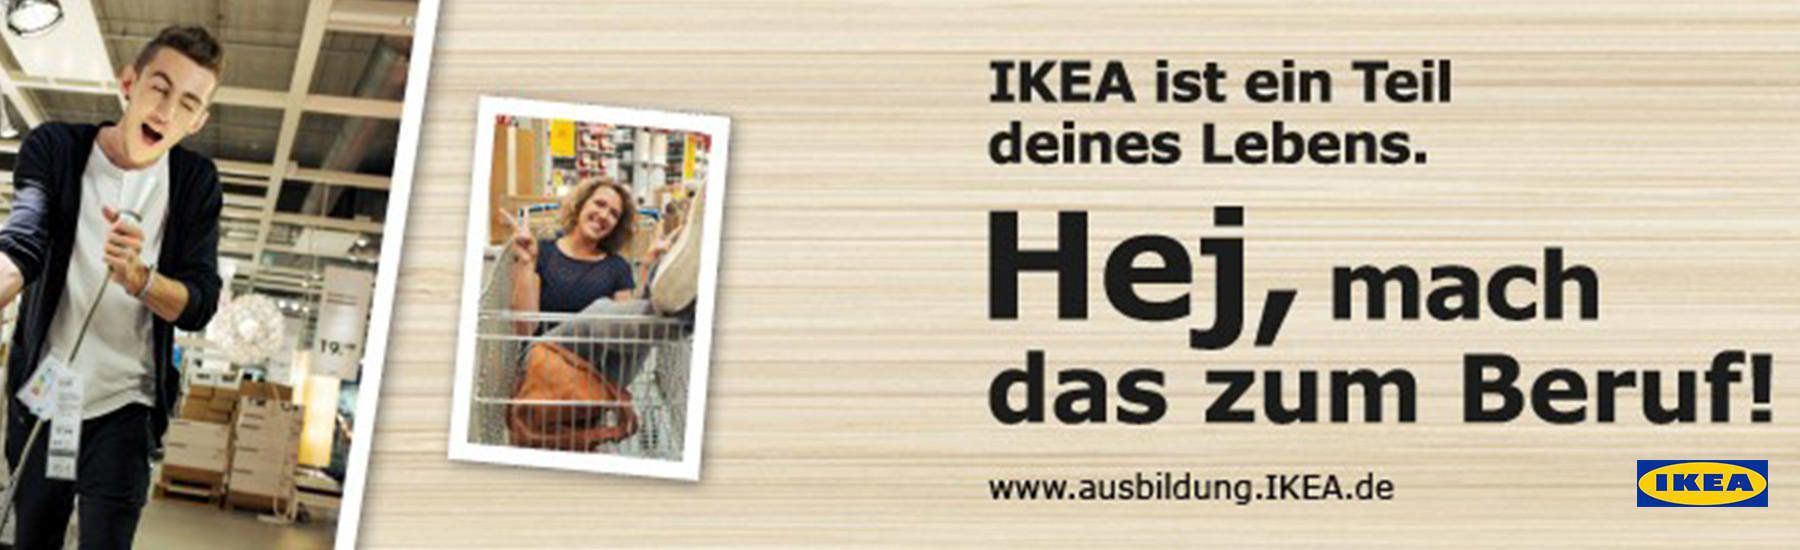 Ausbildung Ikea Freie Ausbildungsplätze